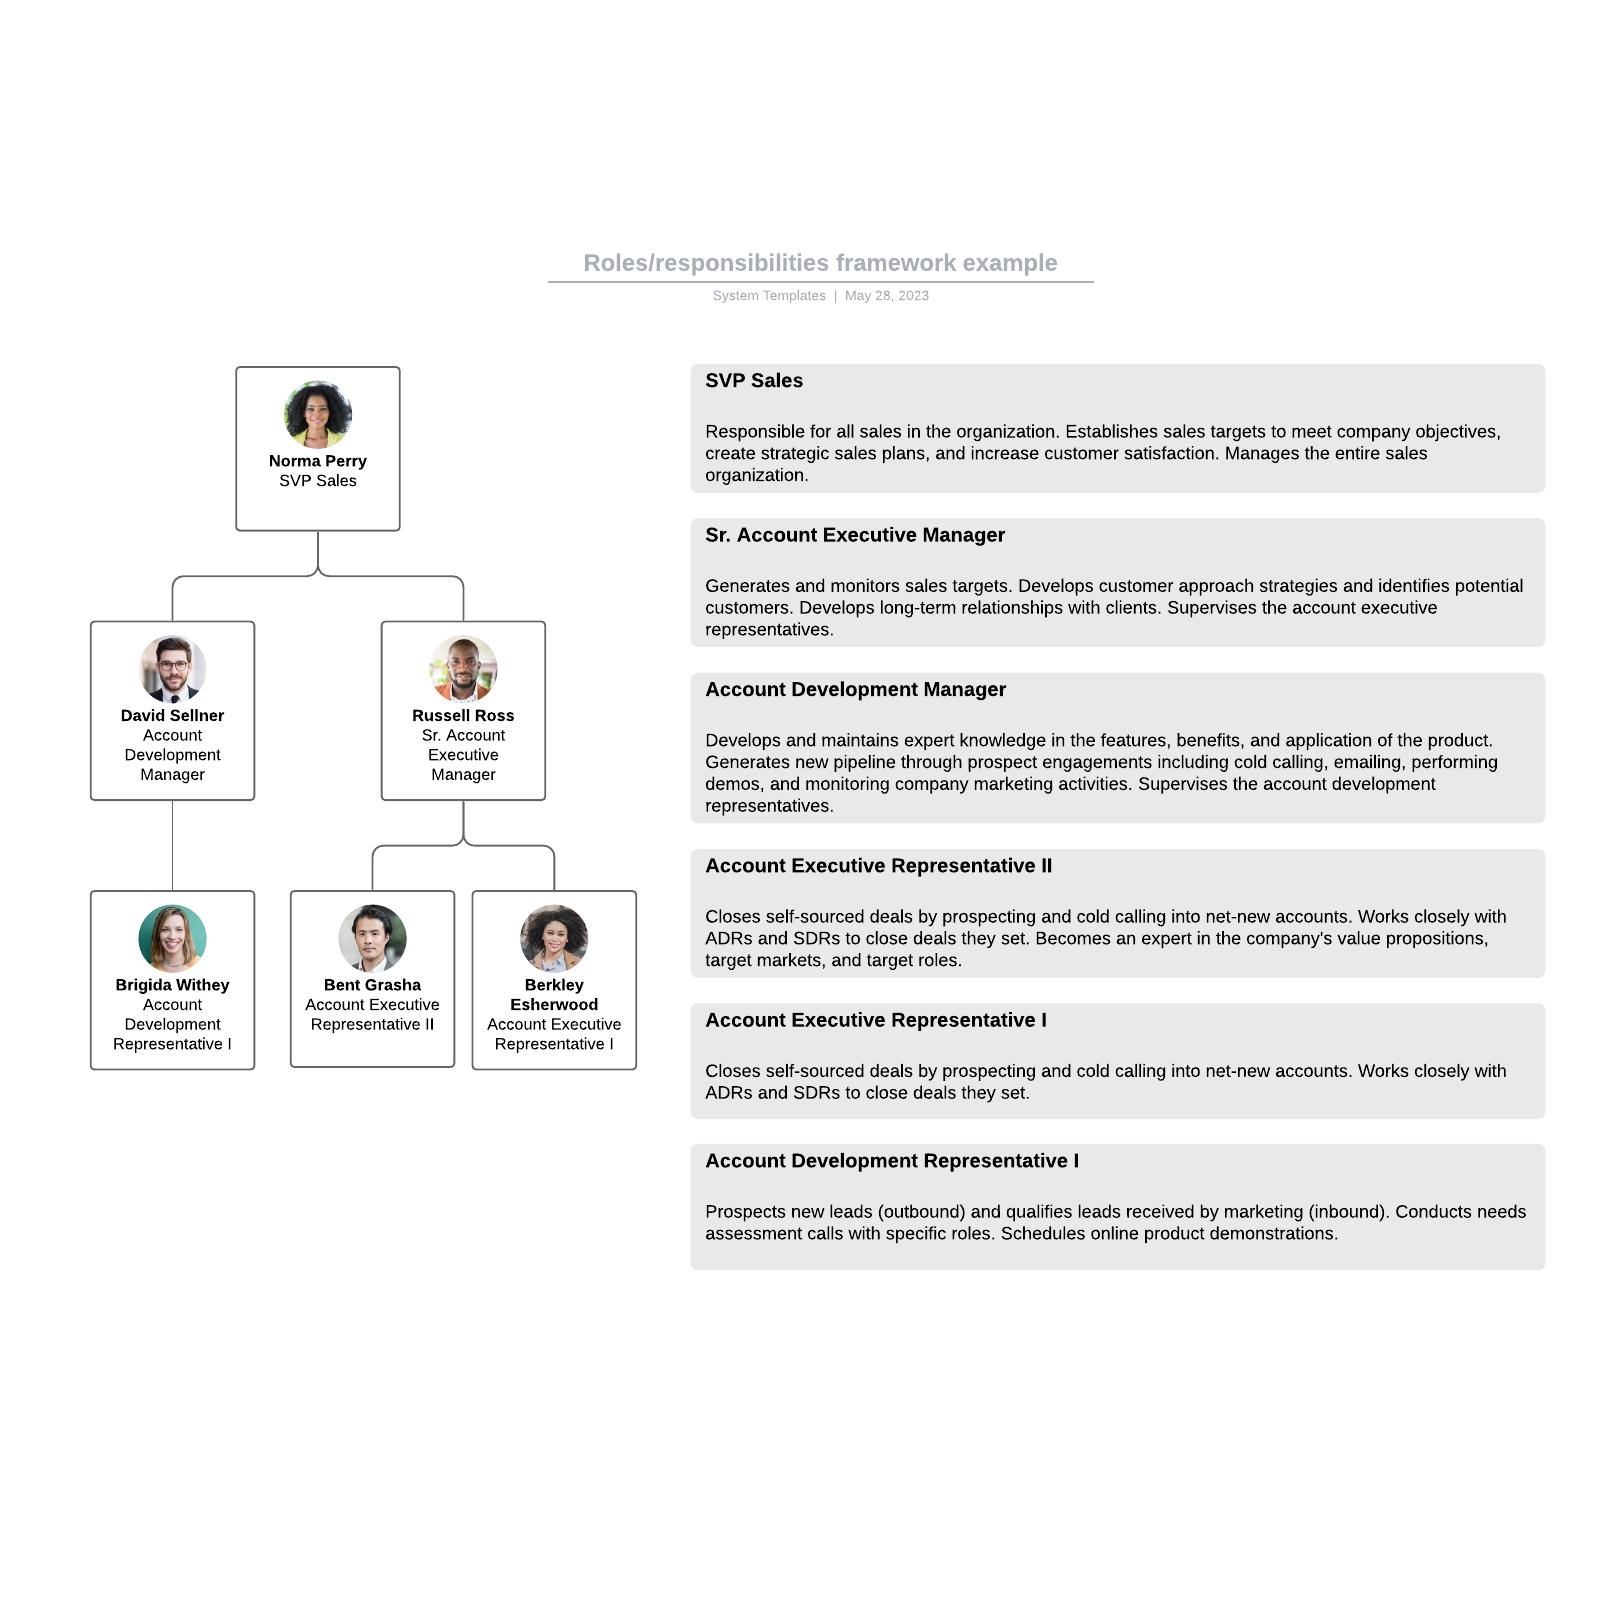 Roles/responsibilities framework example